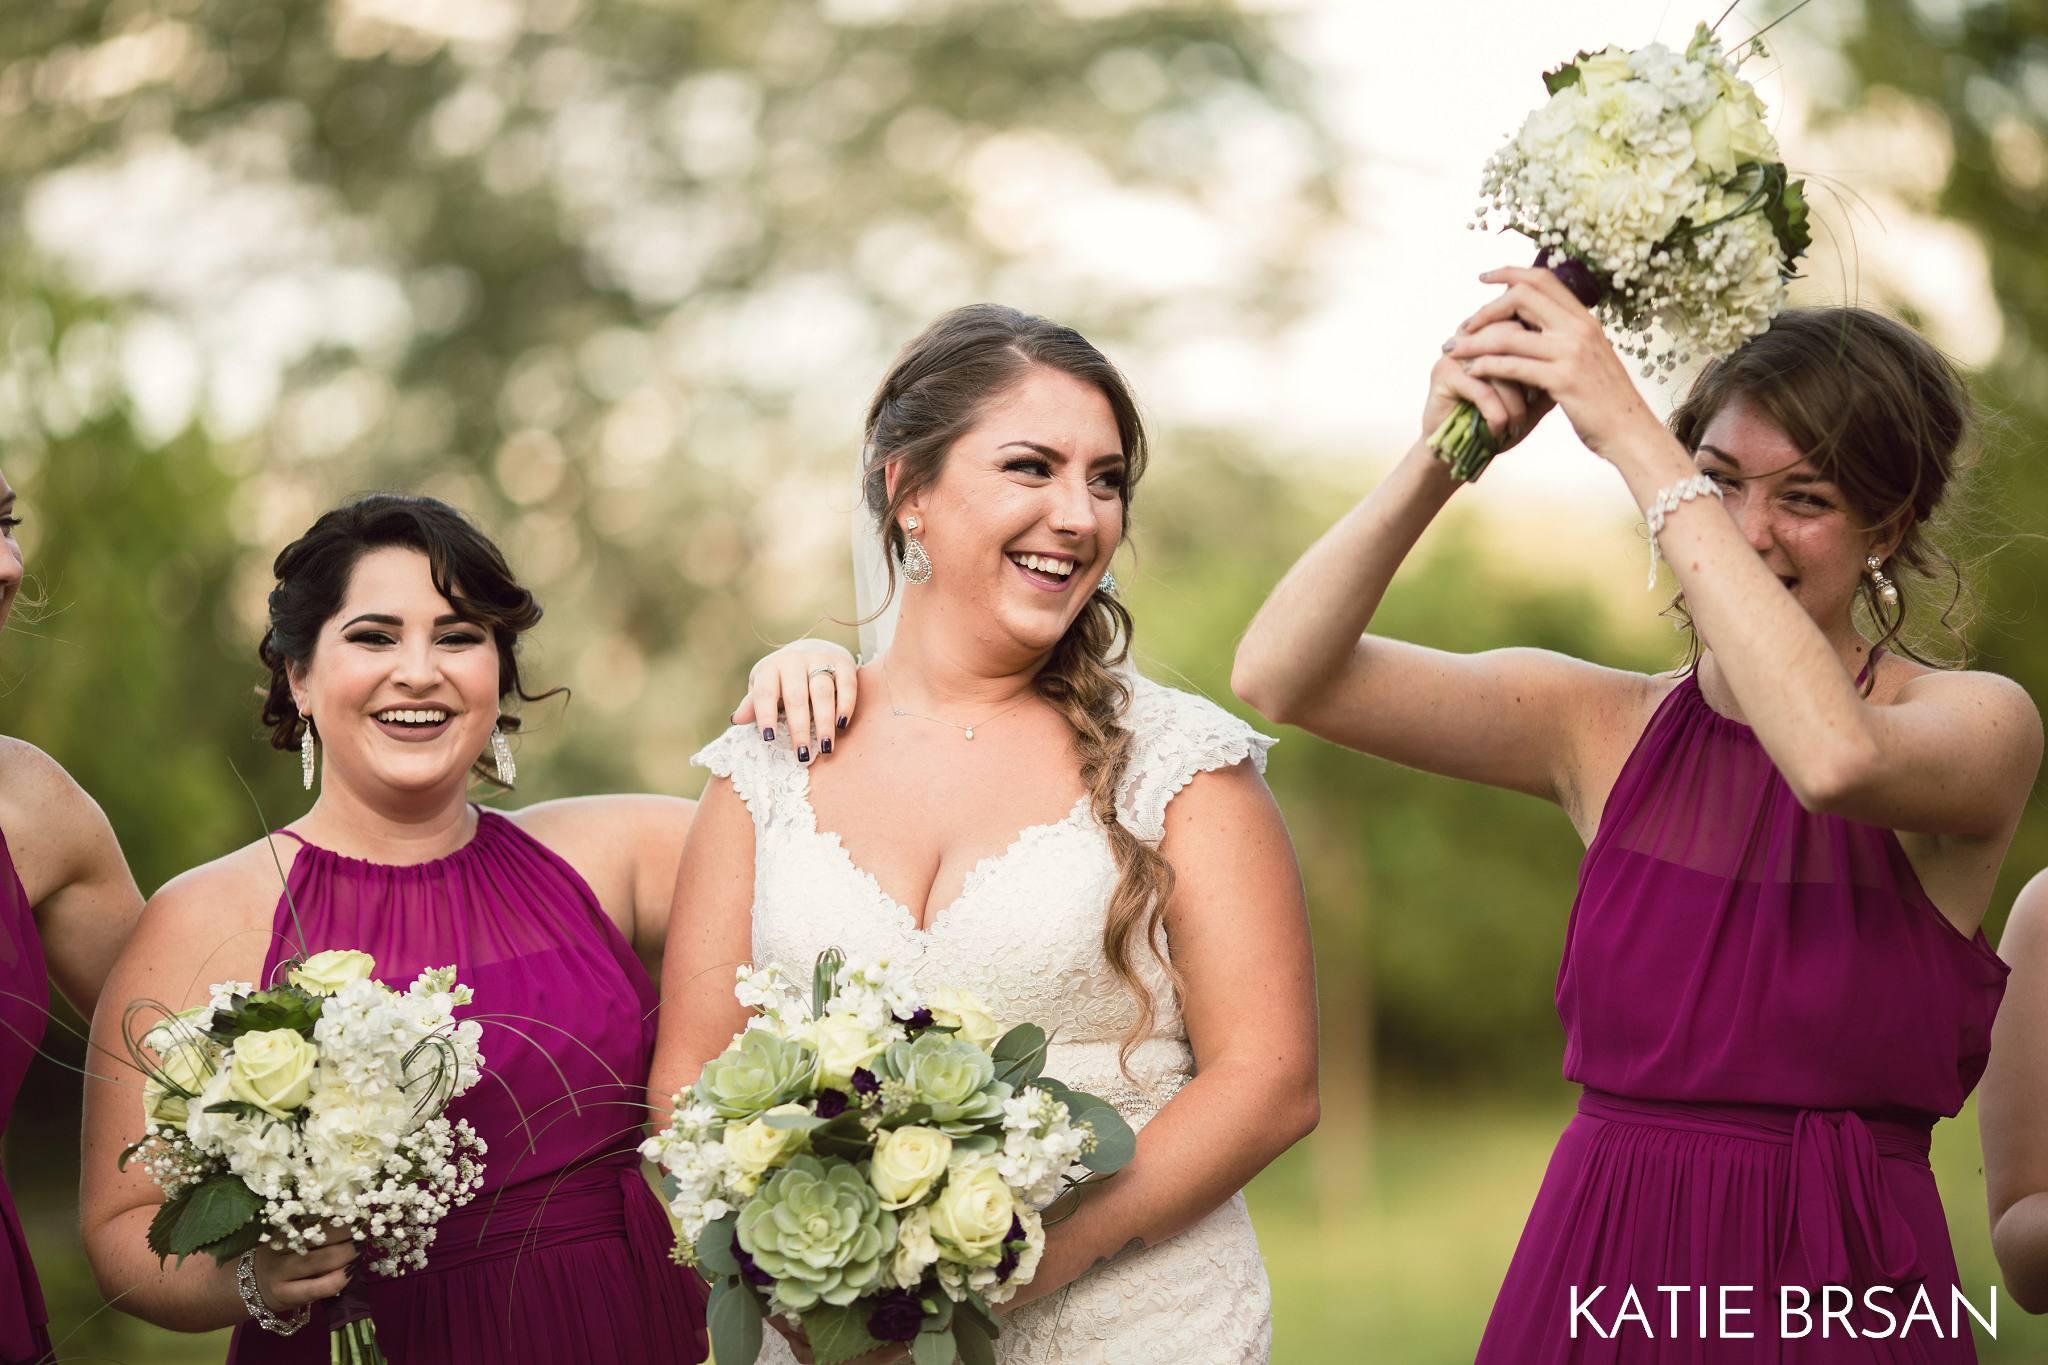 KatieBrsan-Bonfield-Backyard-Wedding_0411.jpg